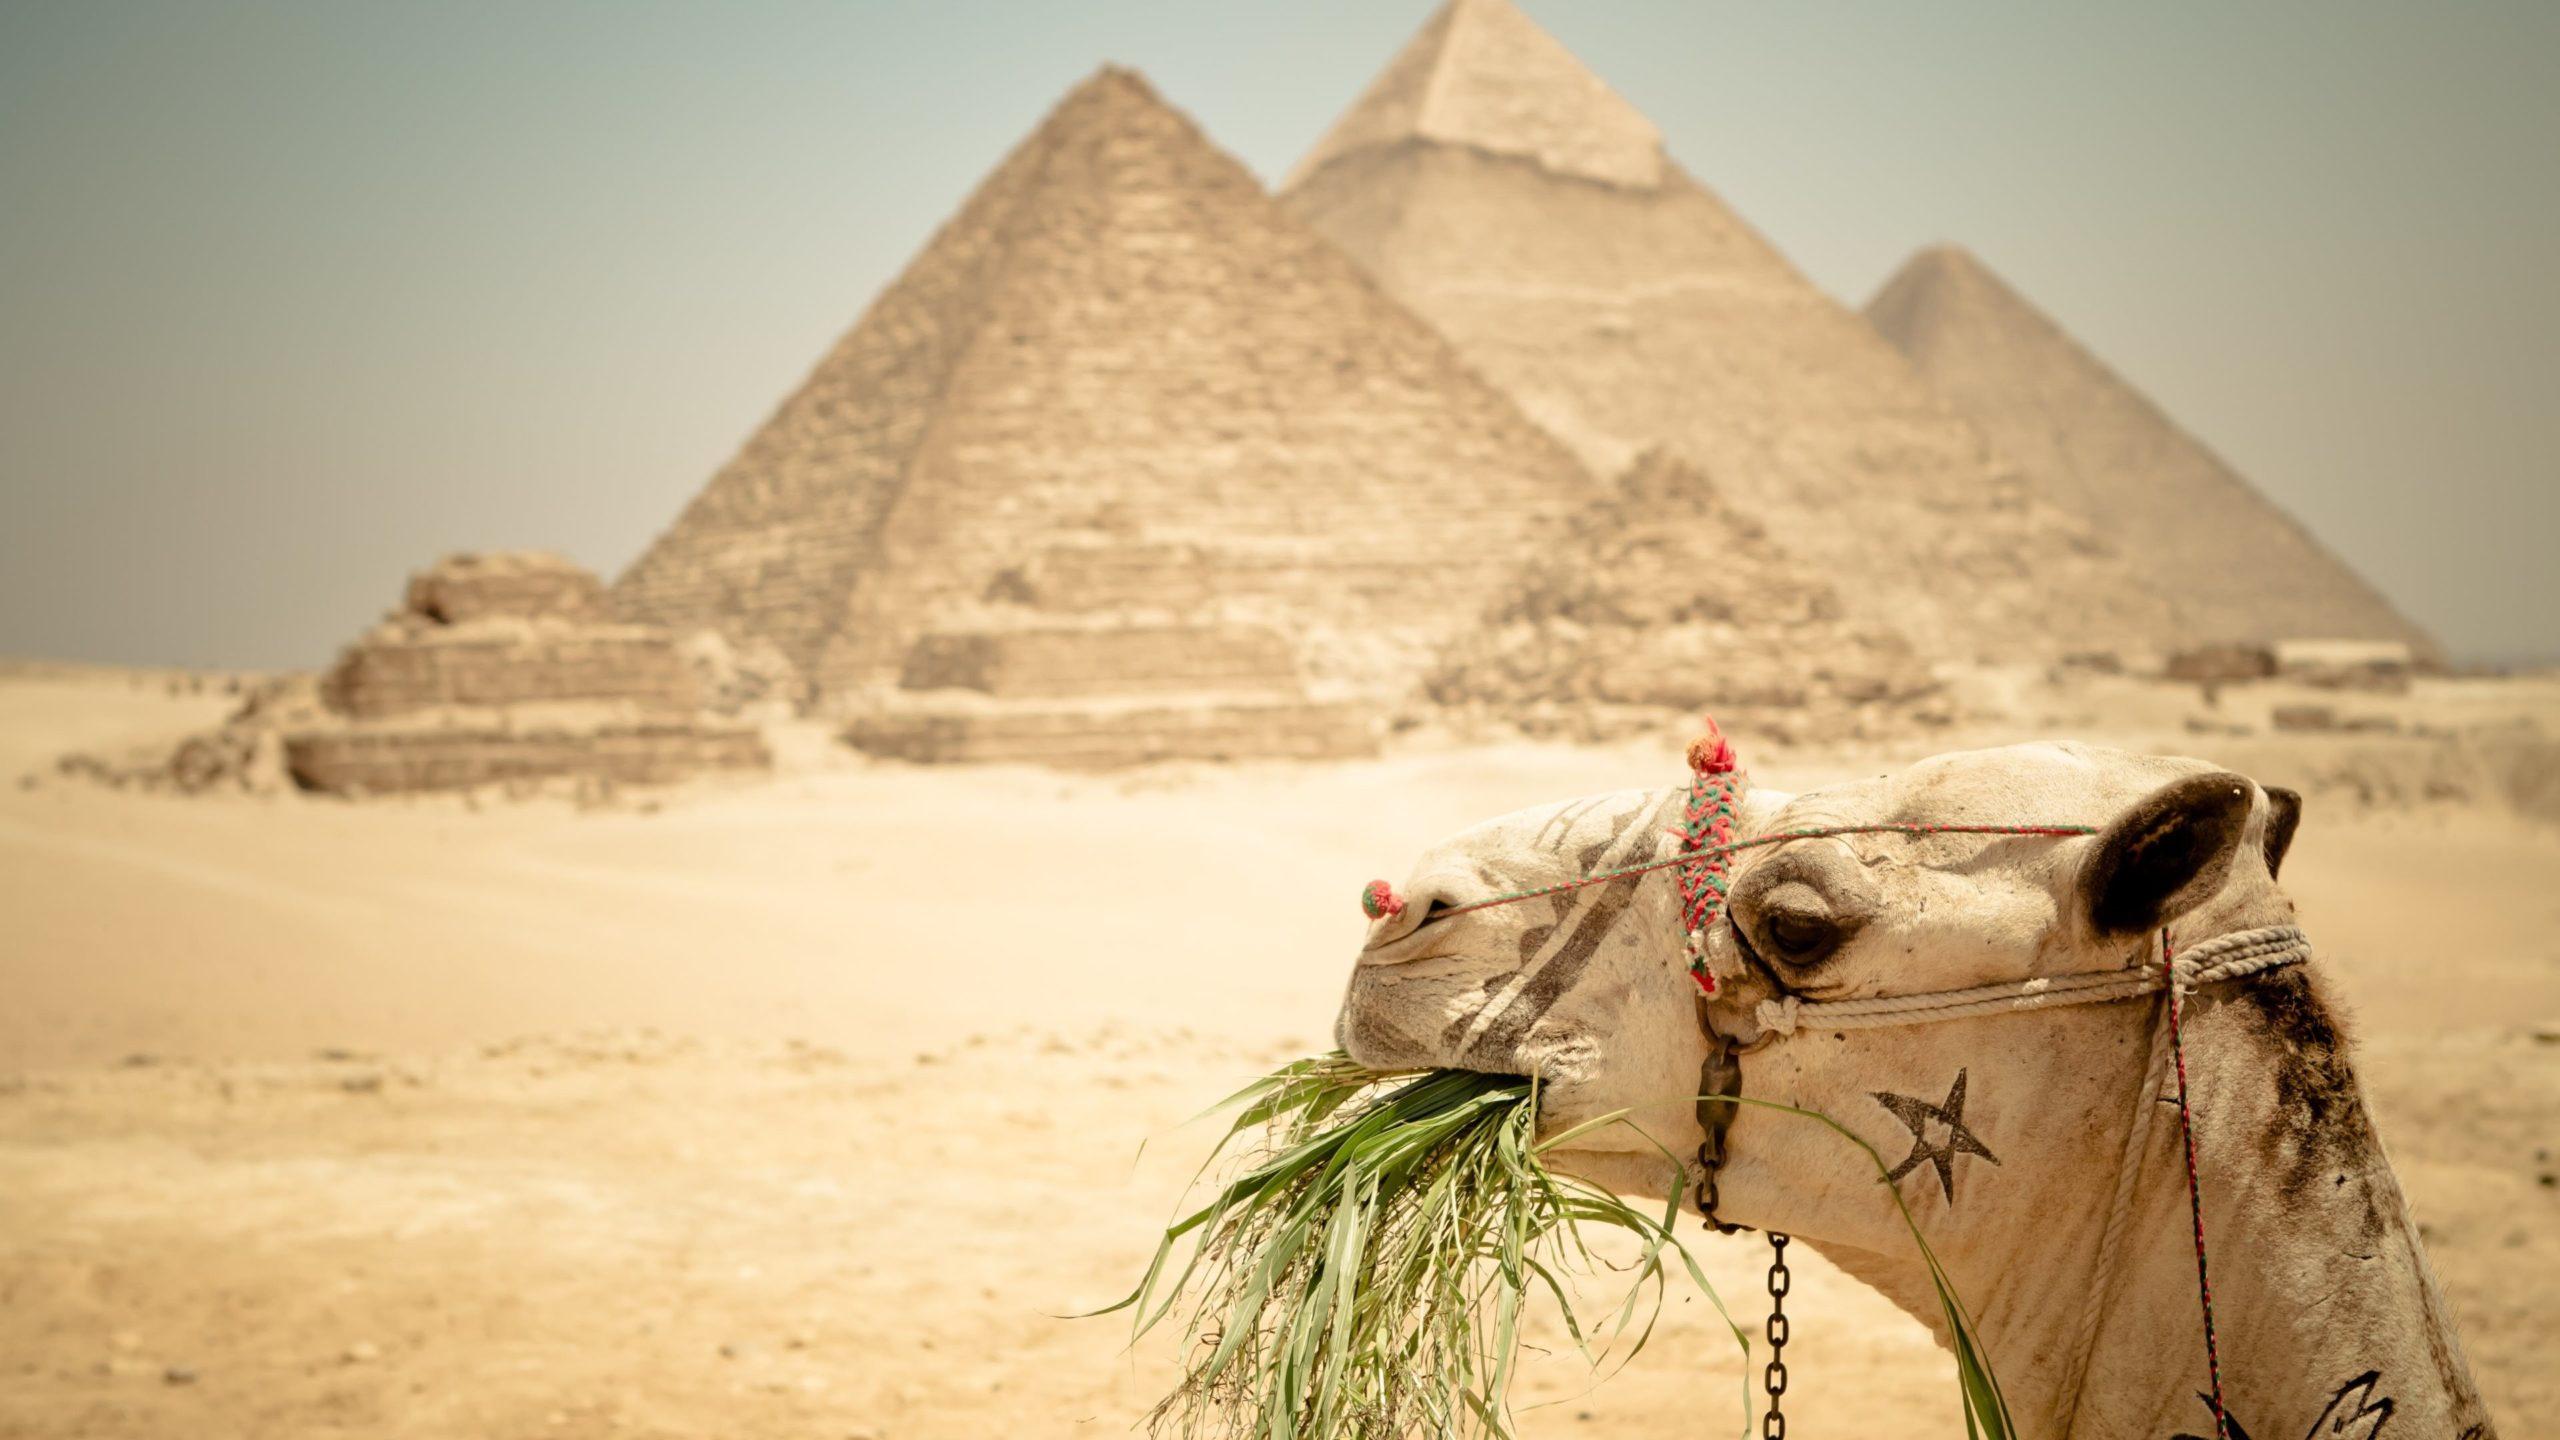 photos of ancient egypt